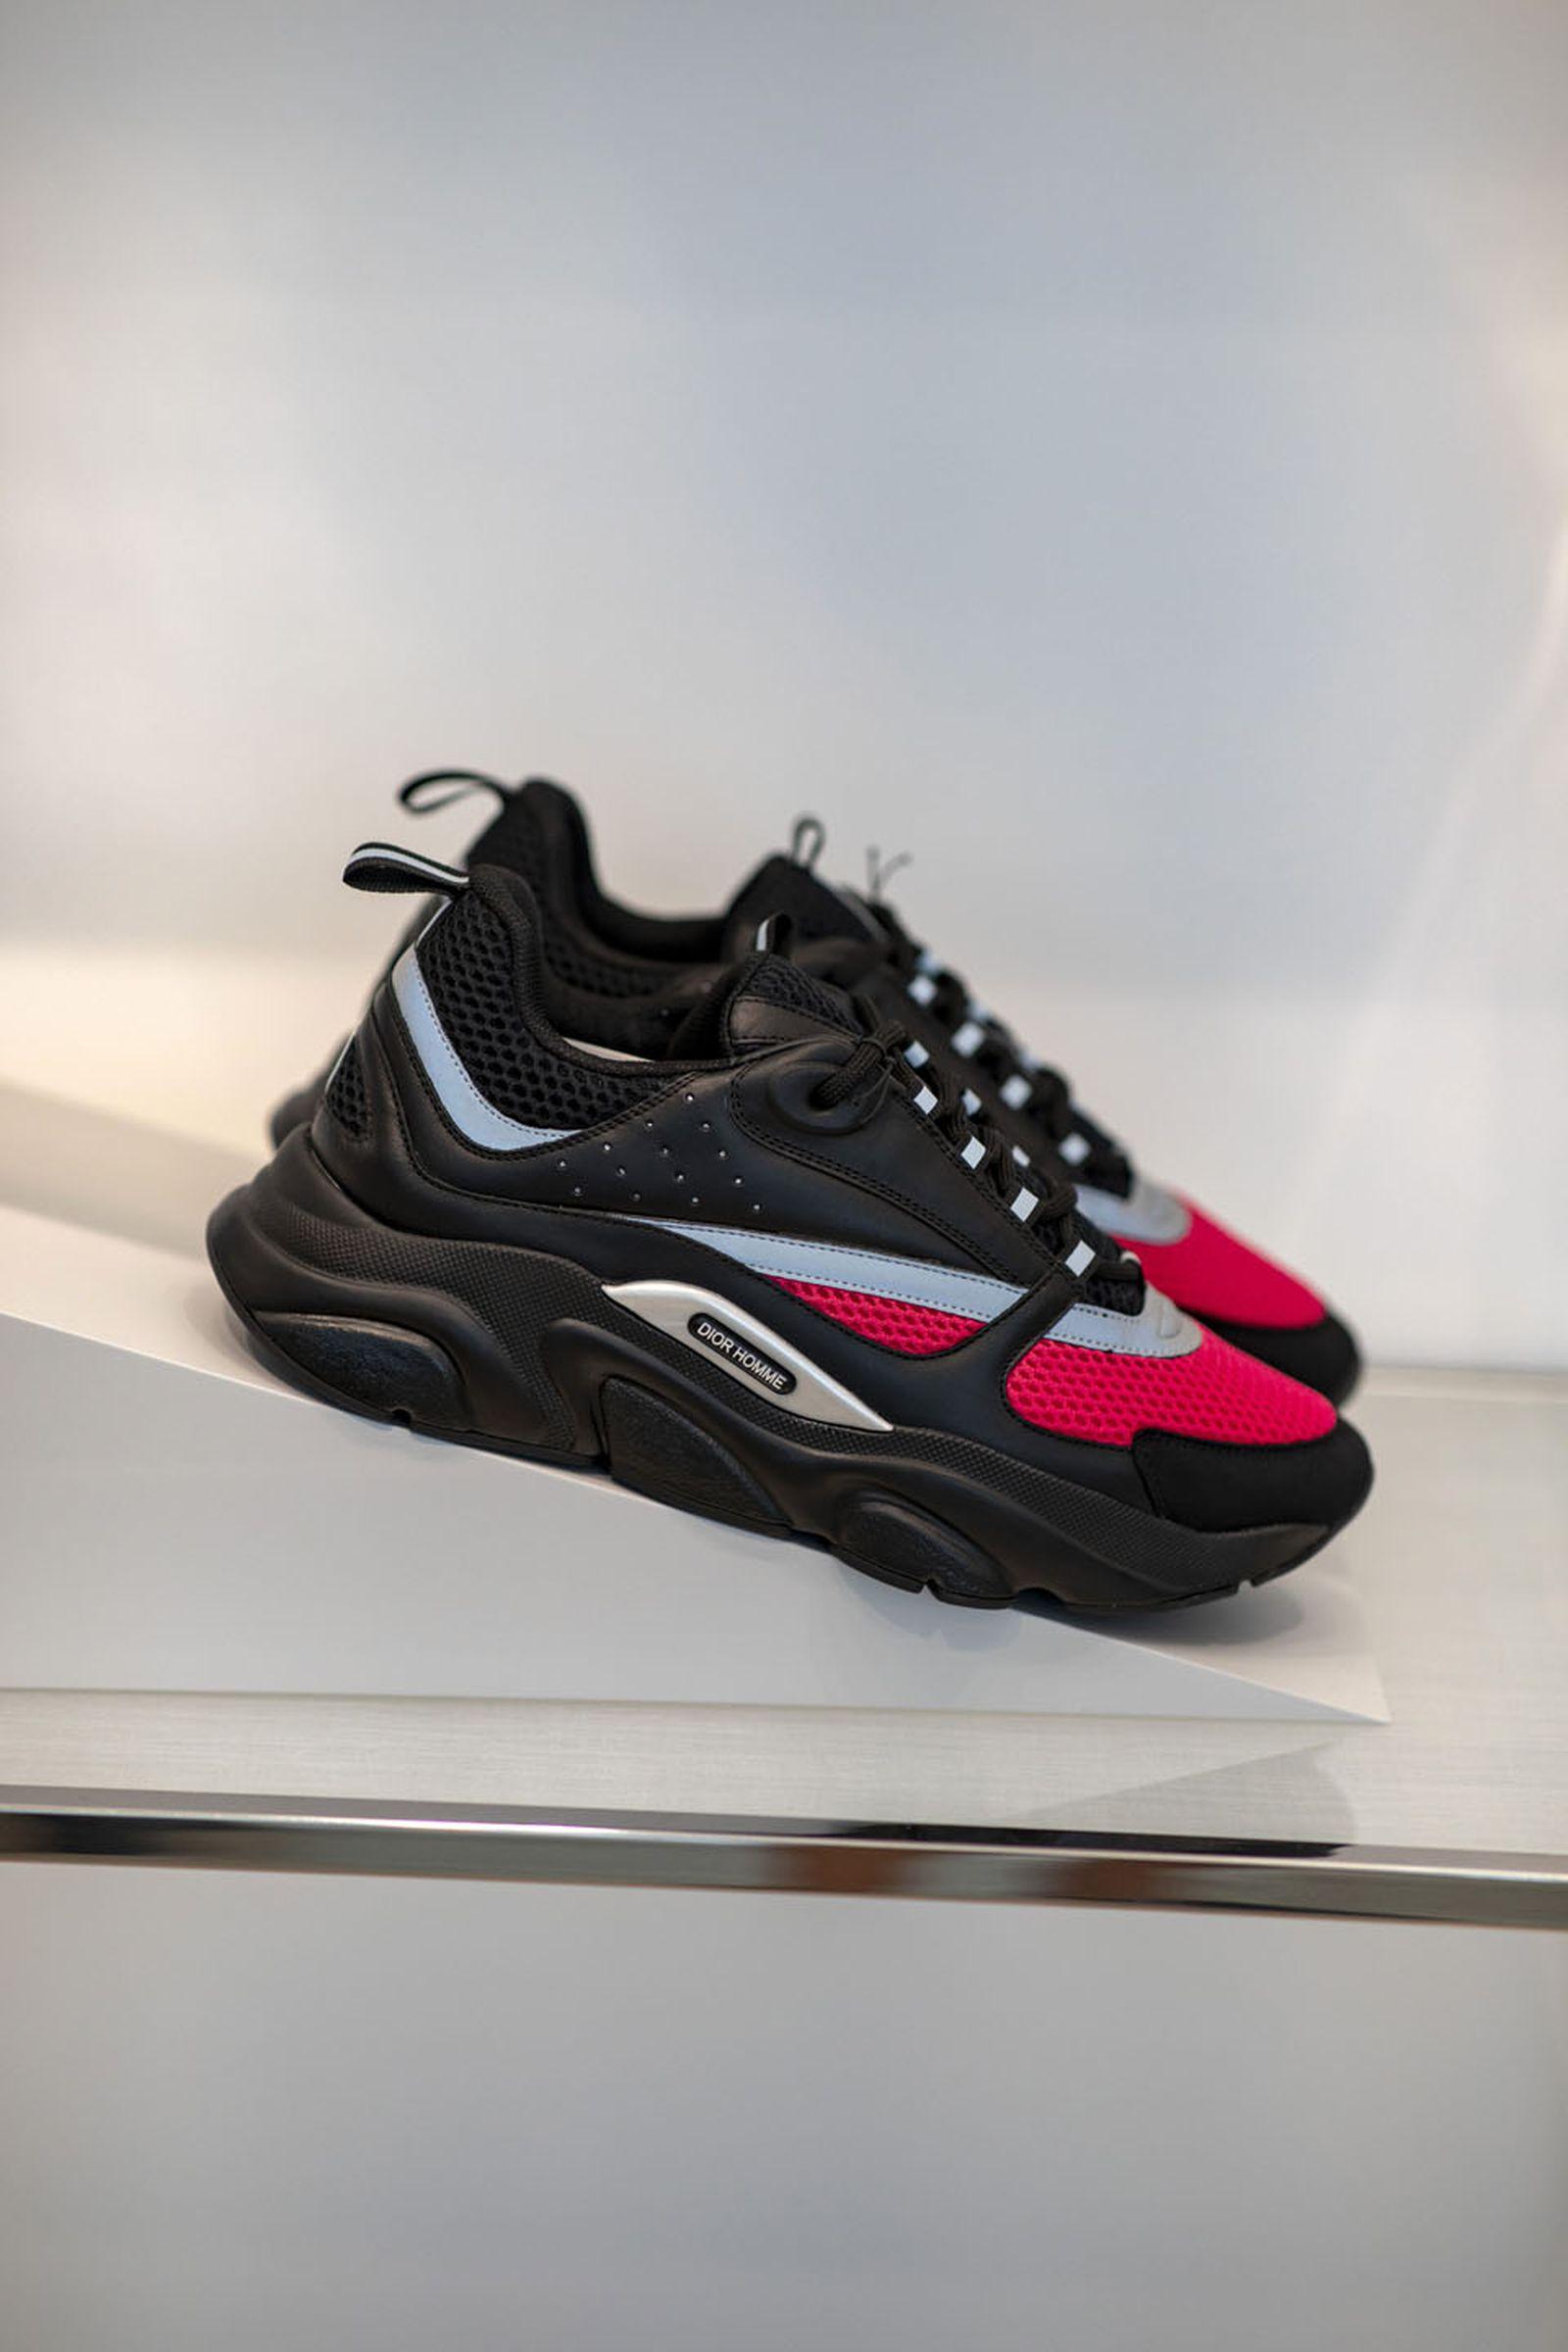 dior ss19 sneakers8 kim jones